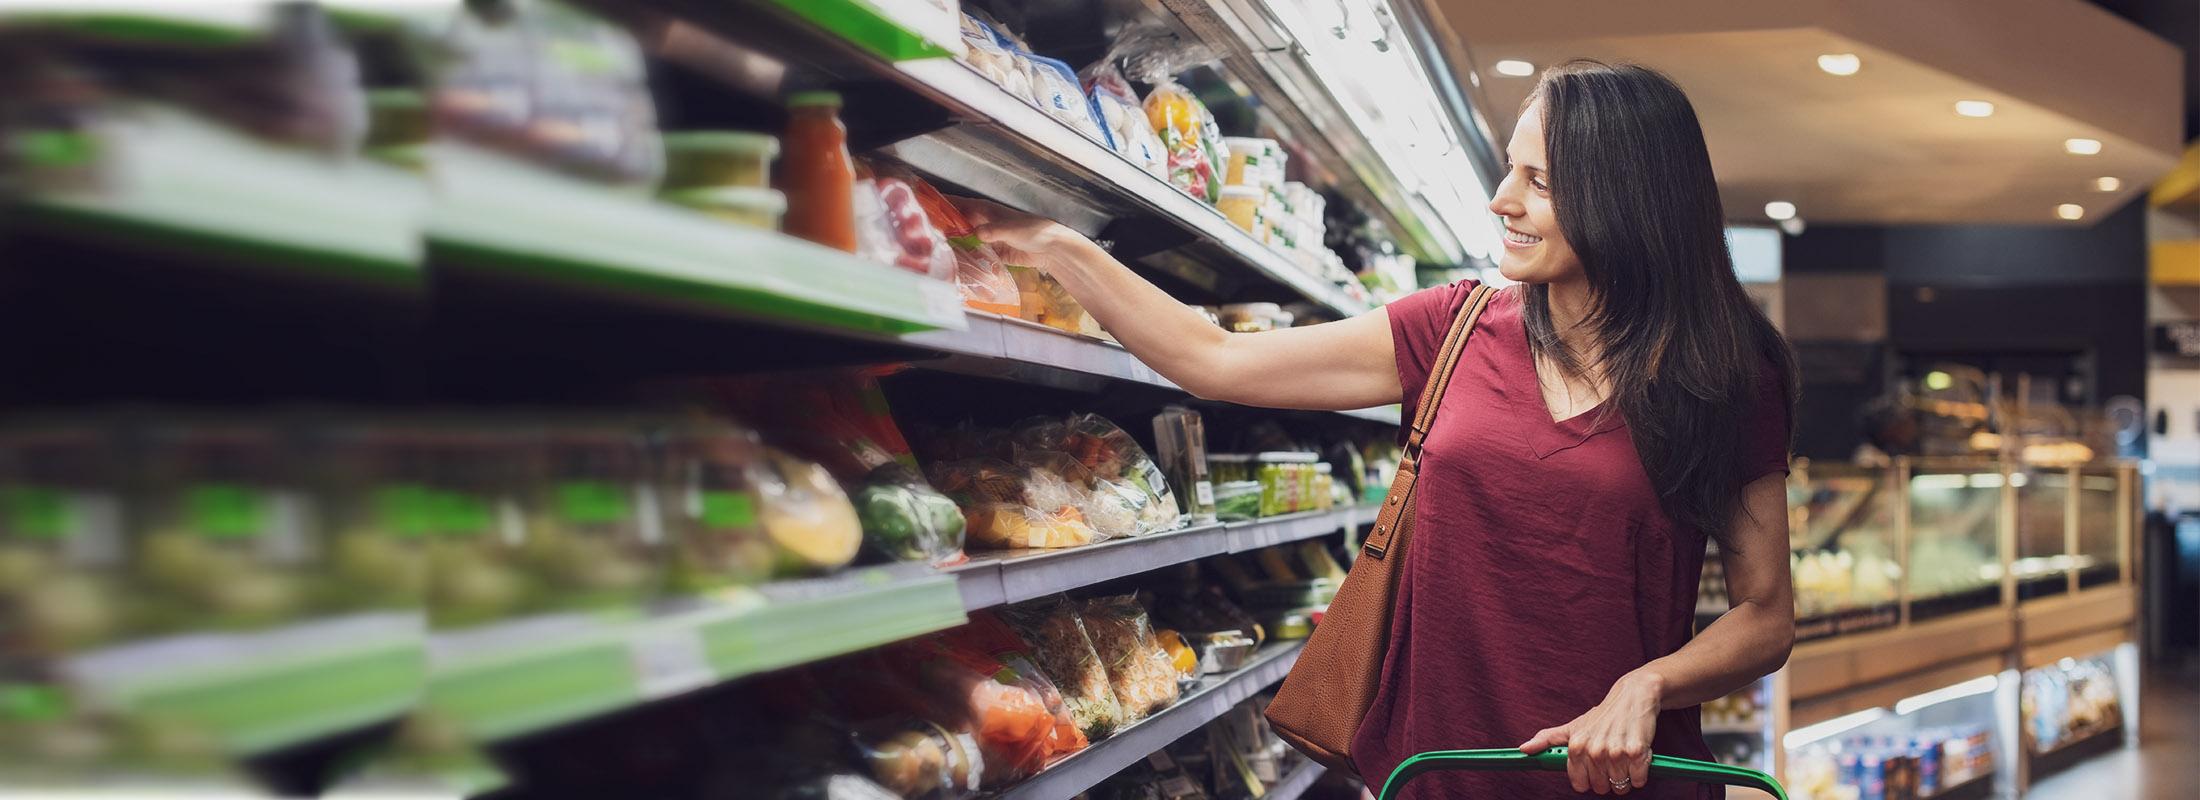 CPRO INDUSTRY SAP Branche Handel und Konsumgüterindustrie